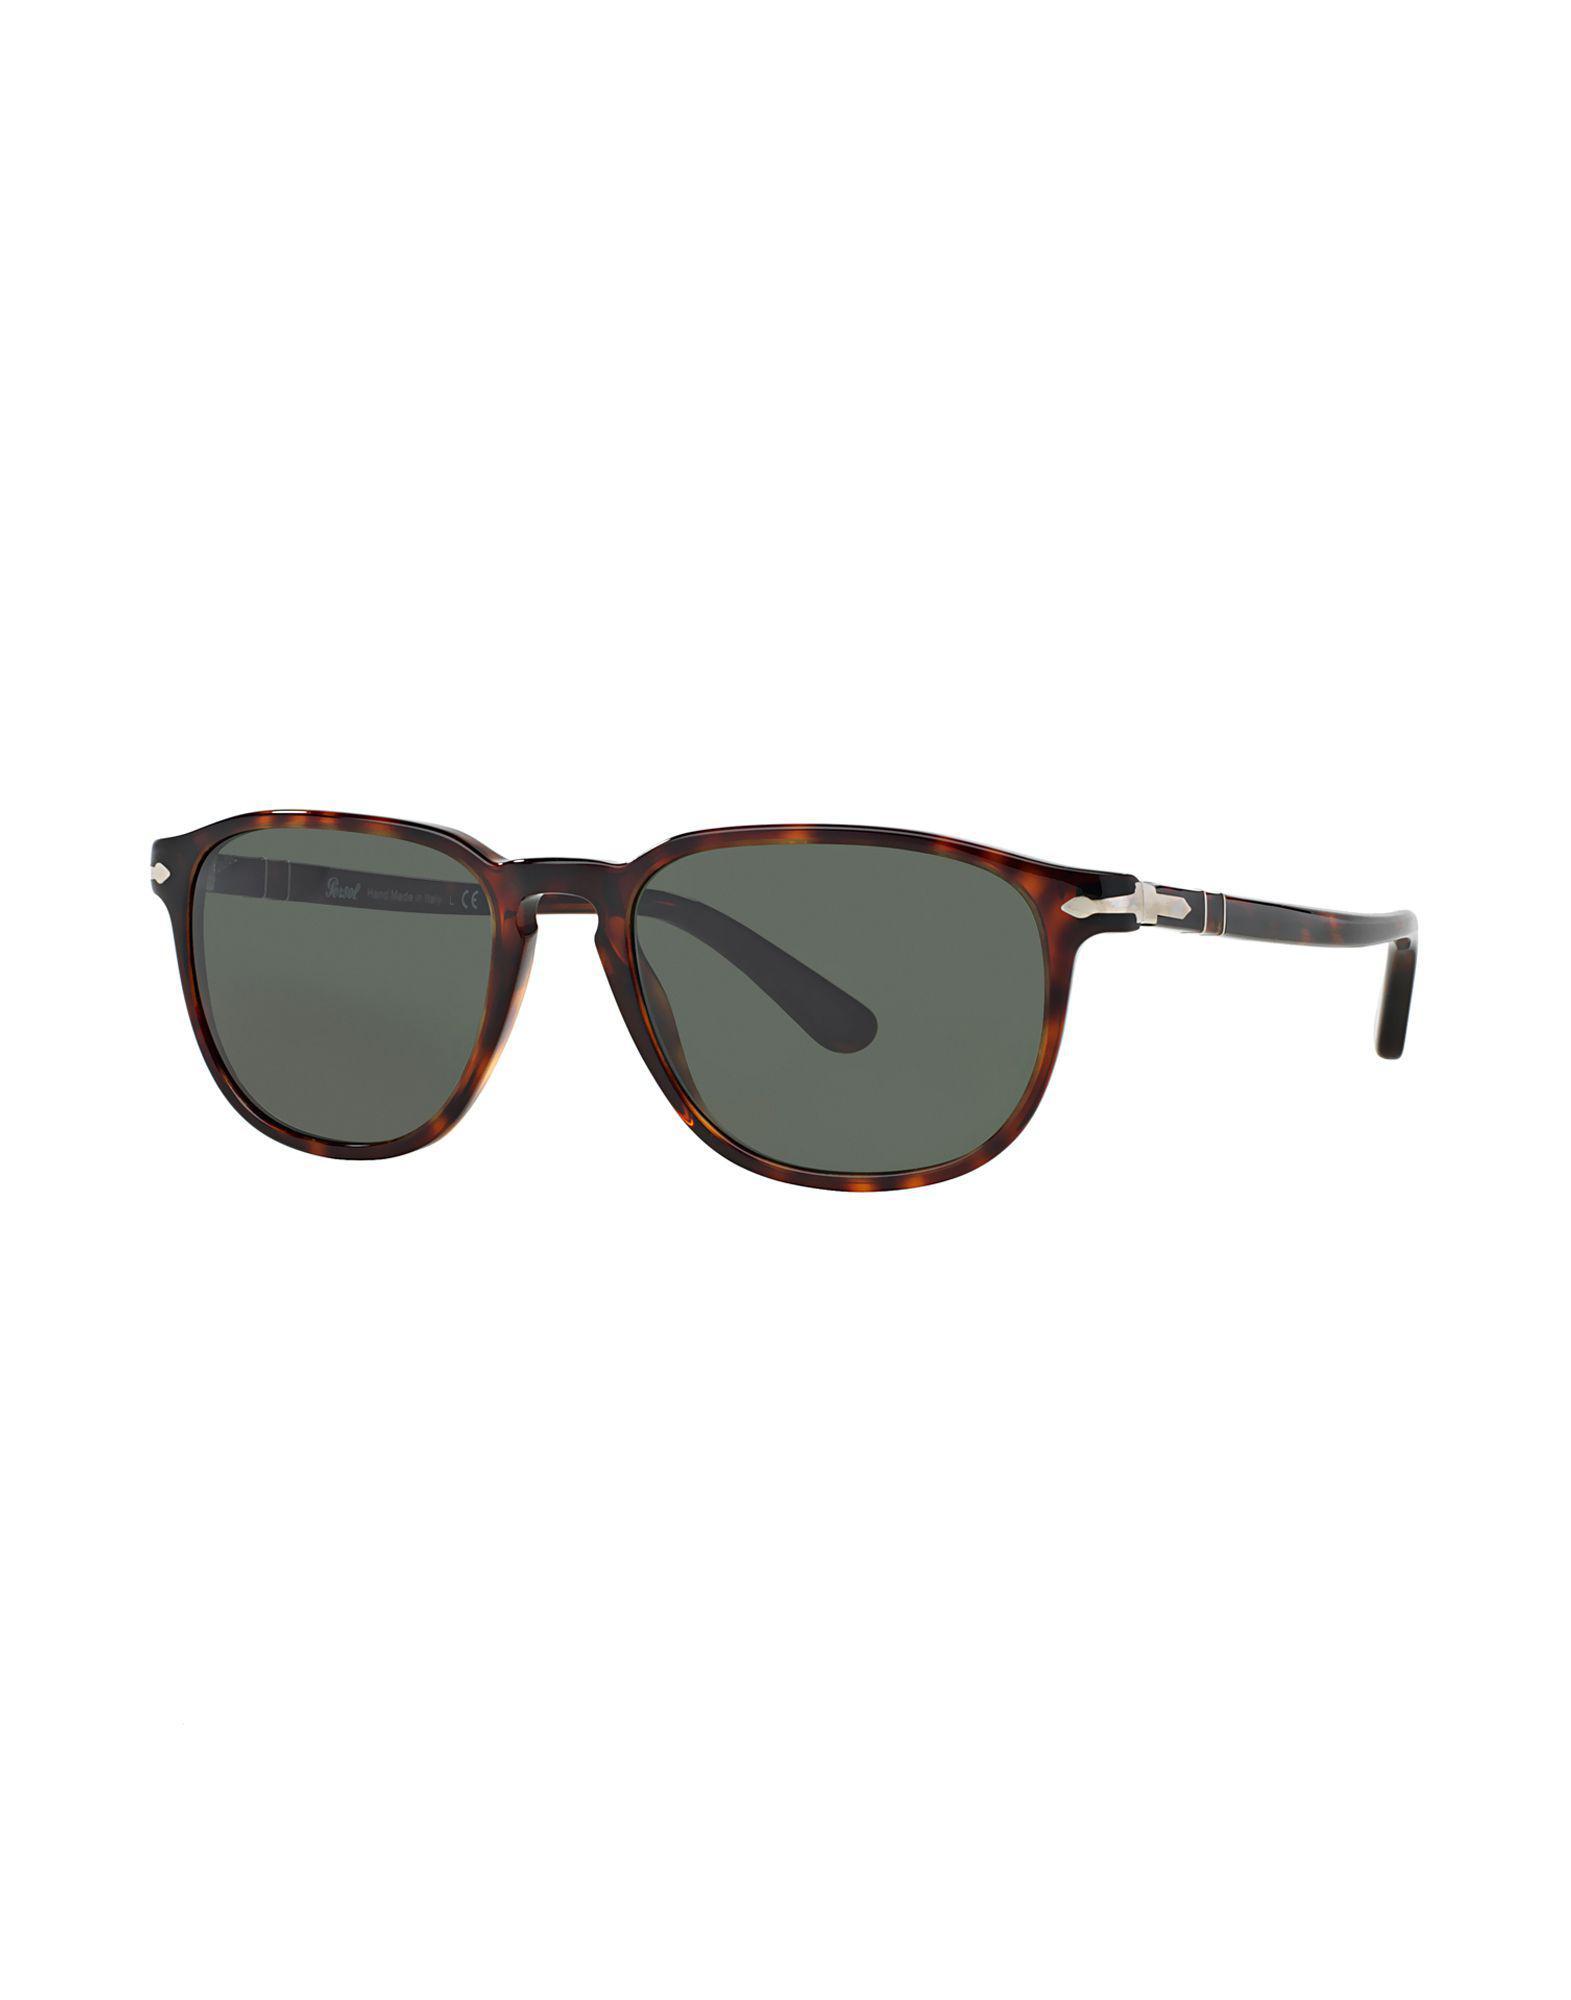 d4b28afc83 Persol. Gafas de sol de mujer de color marrón